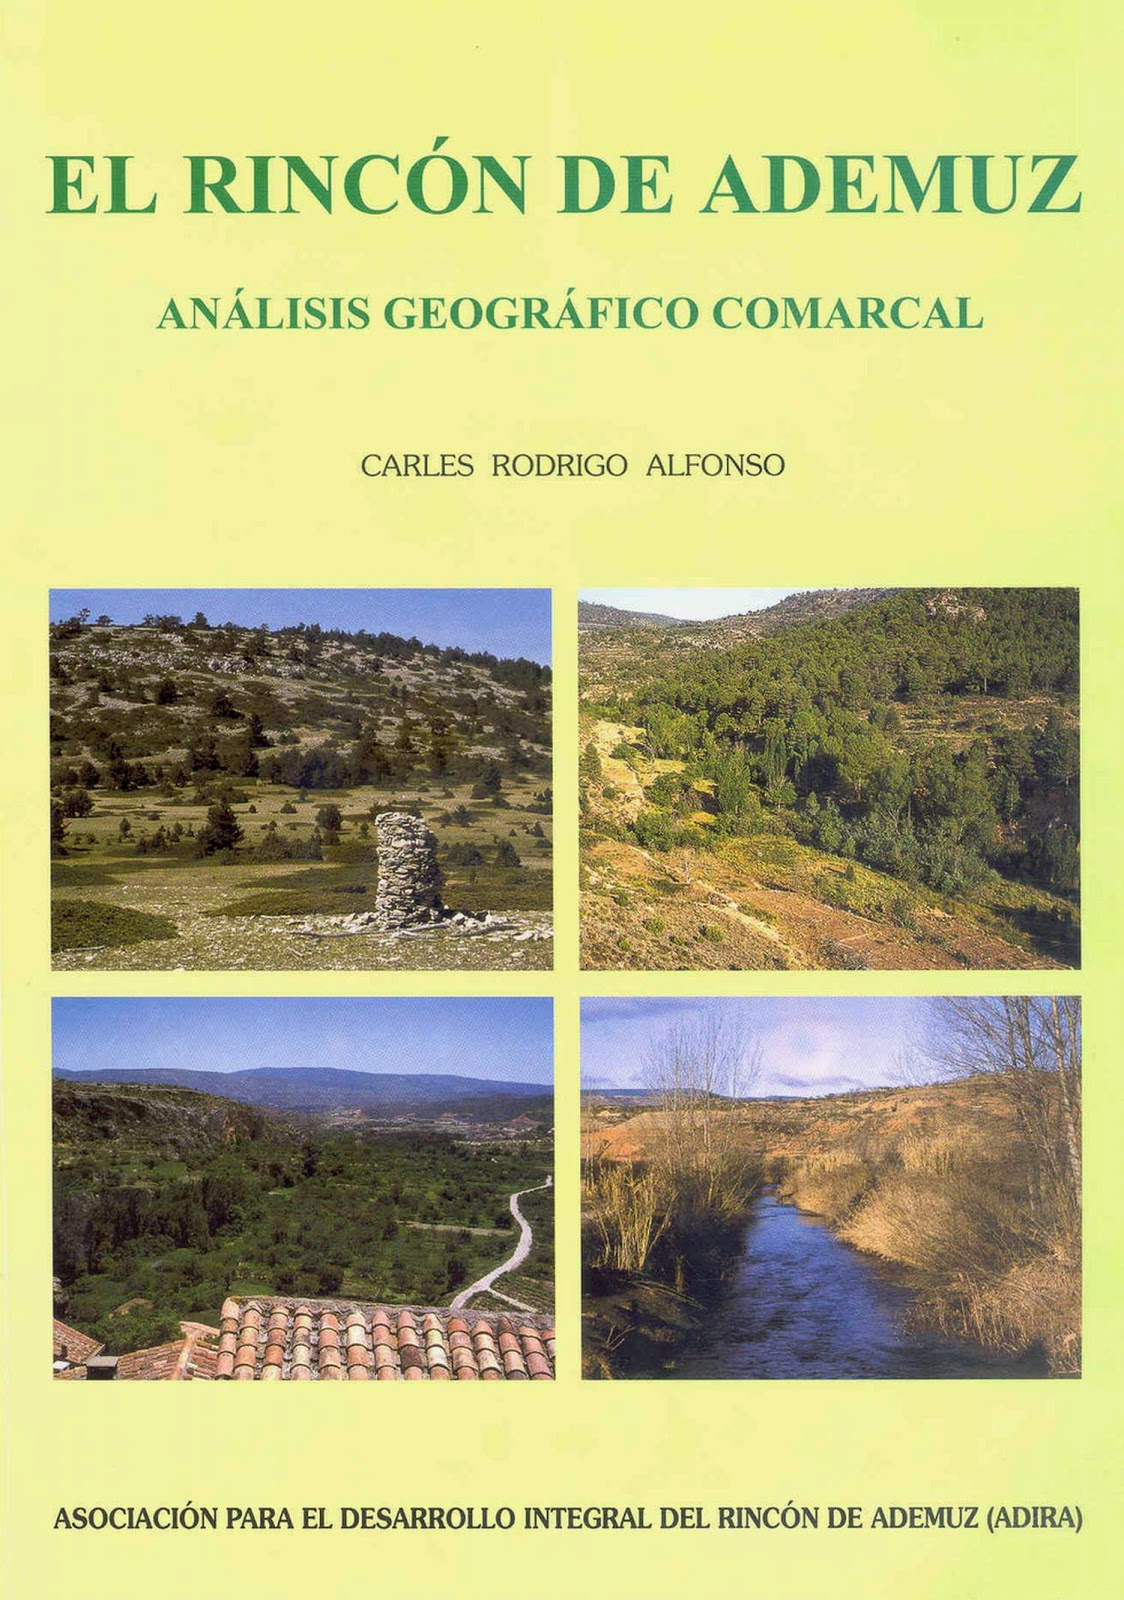 rincon-ademuz-analisis-geografico-comarcal